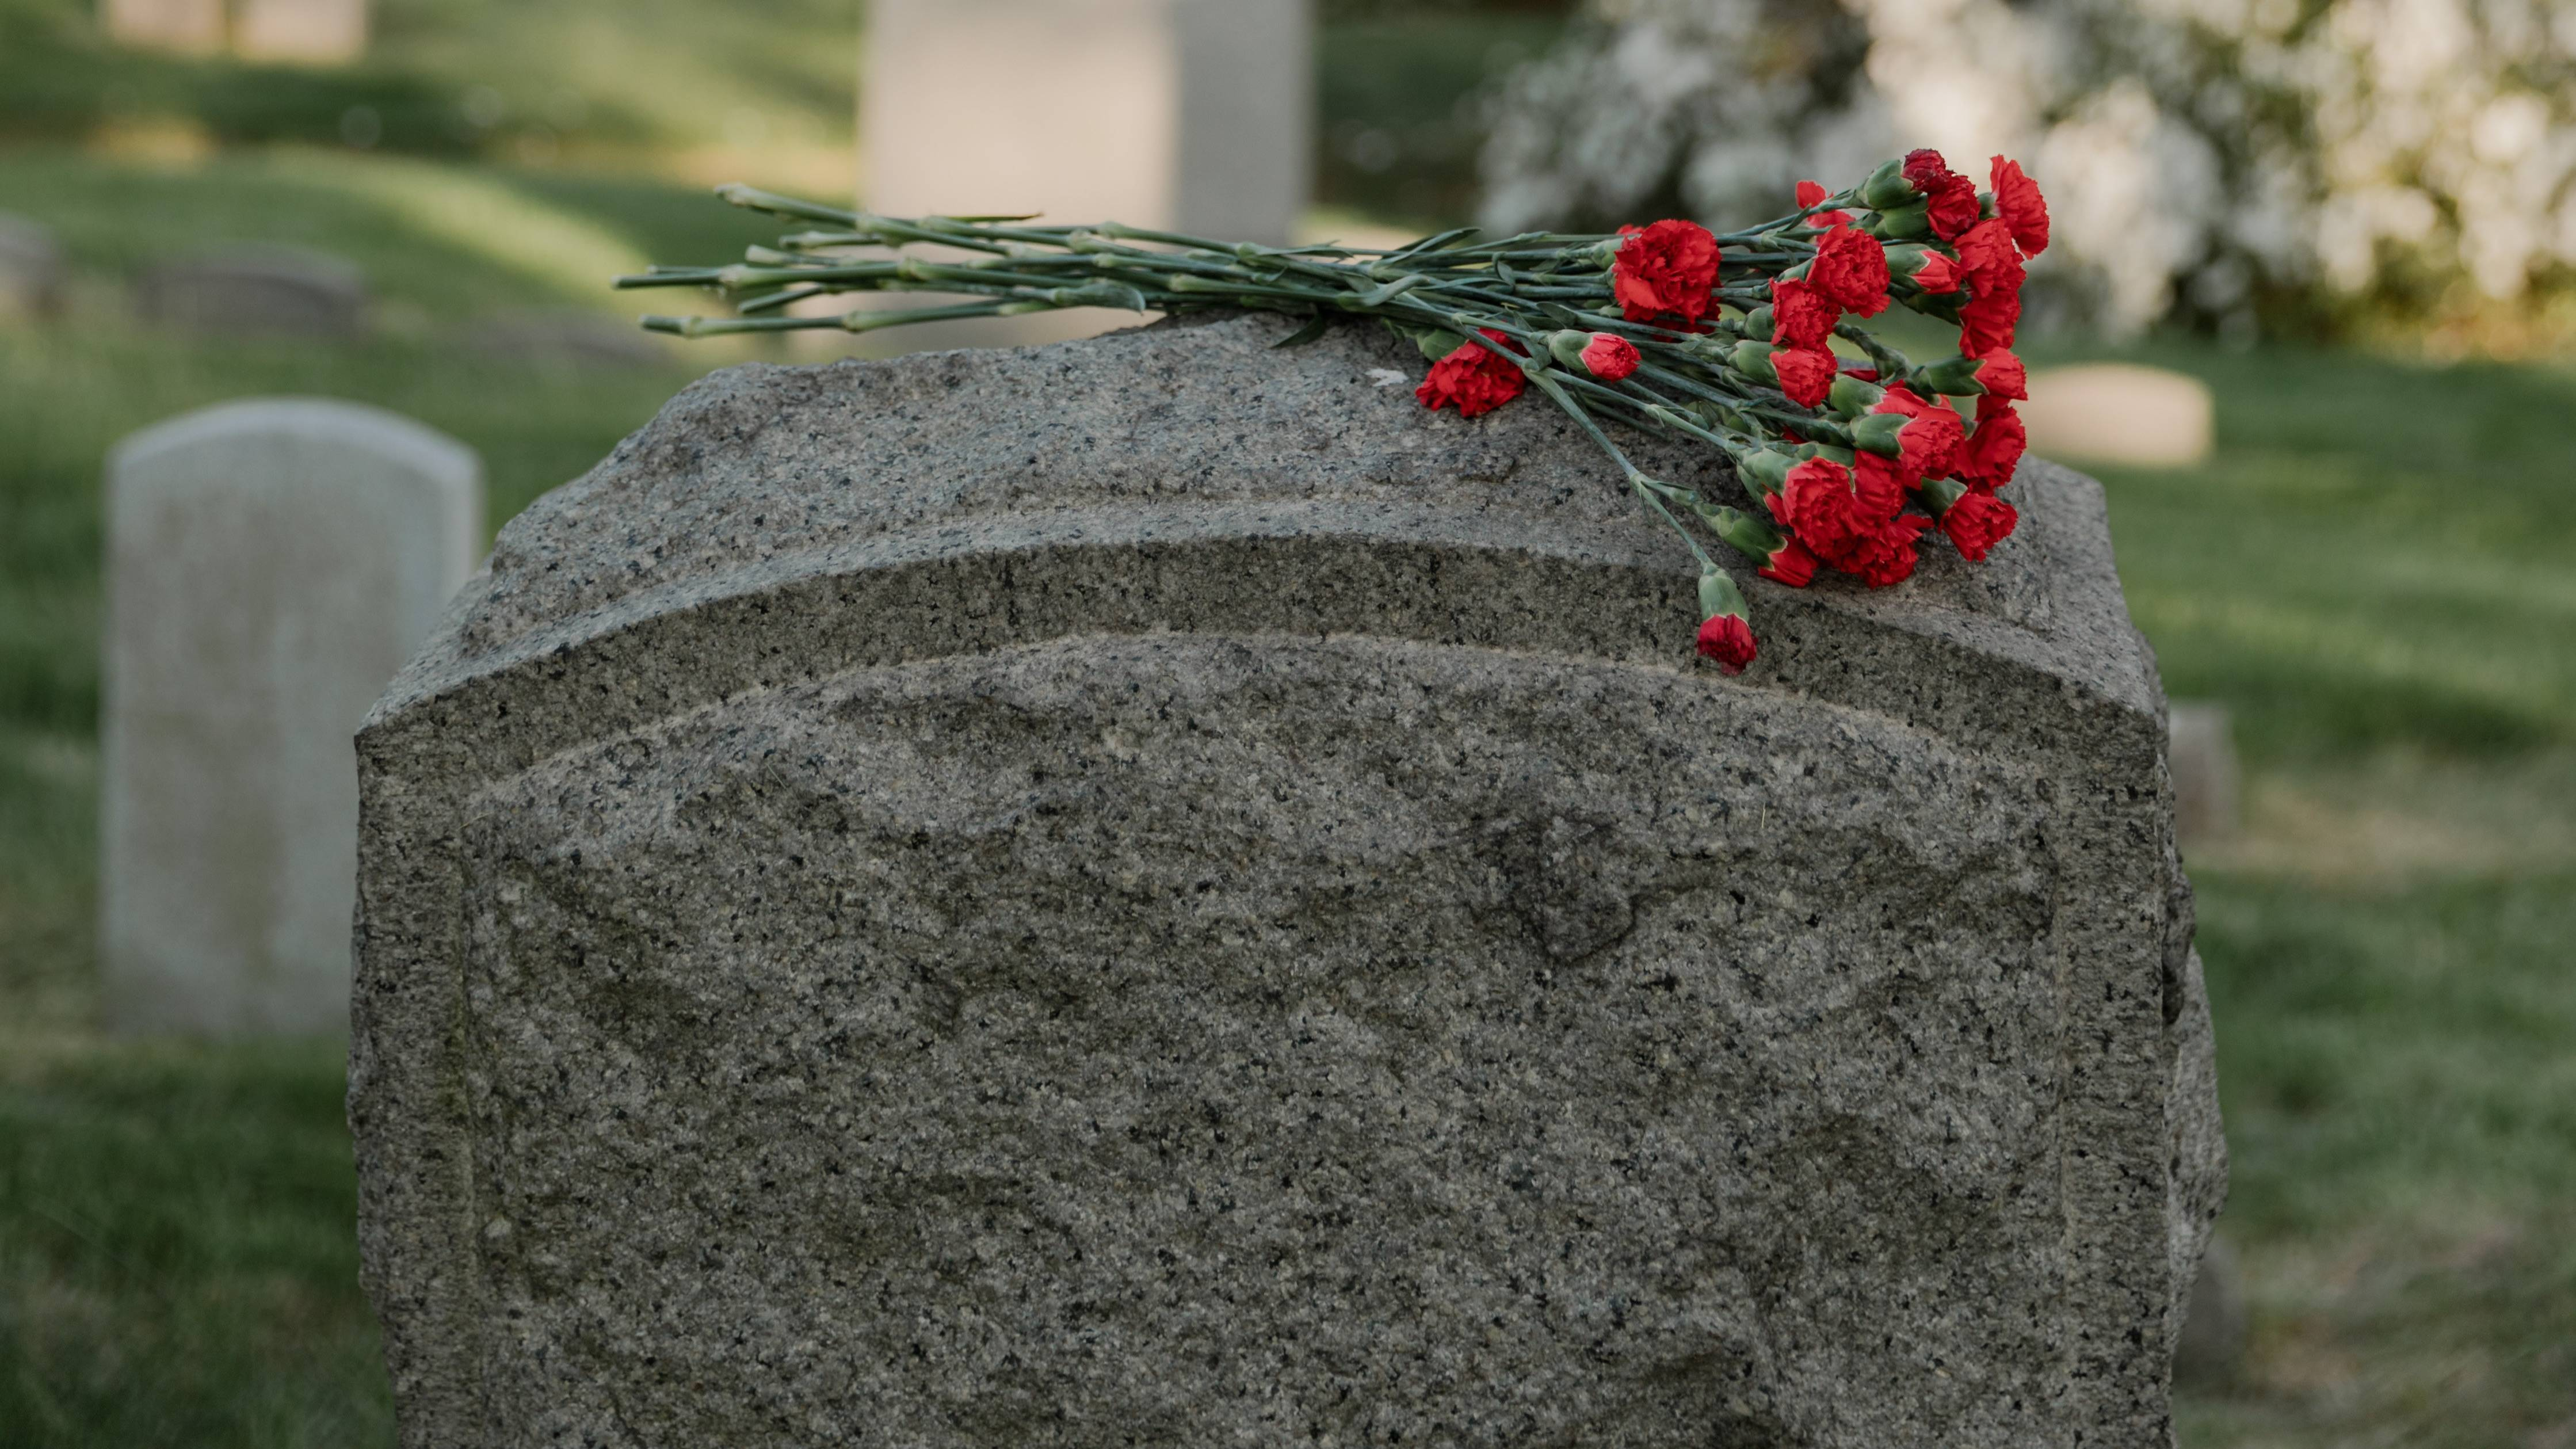 Из-за коронавируса поставлен рекорд по количеству смертей глав государств